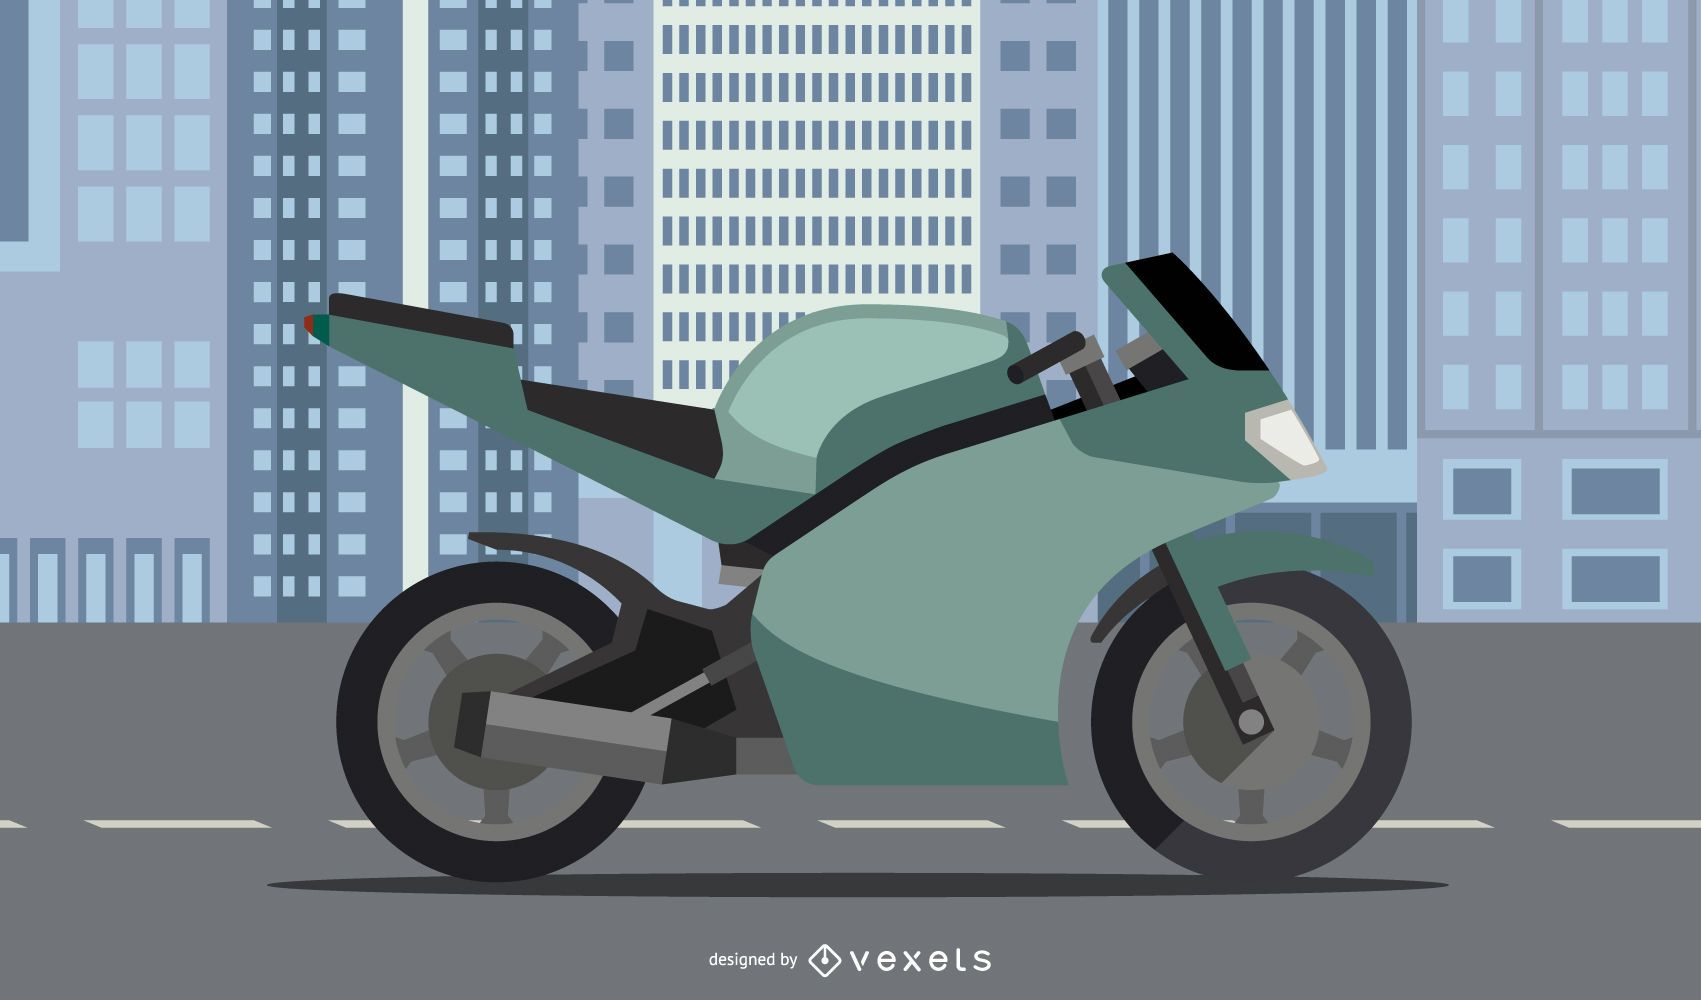 Vector de moto ducati diavel